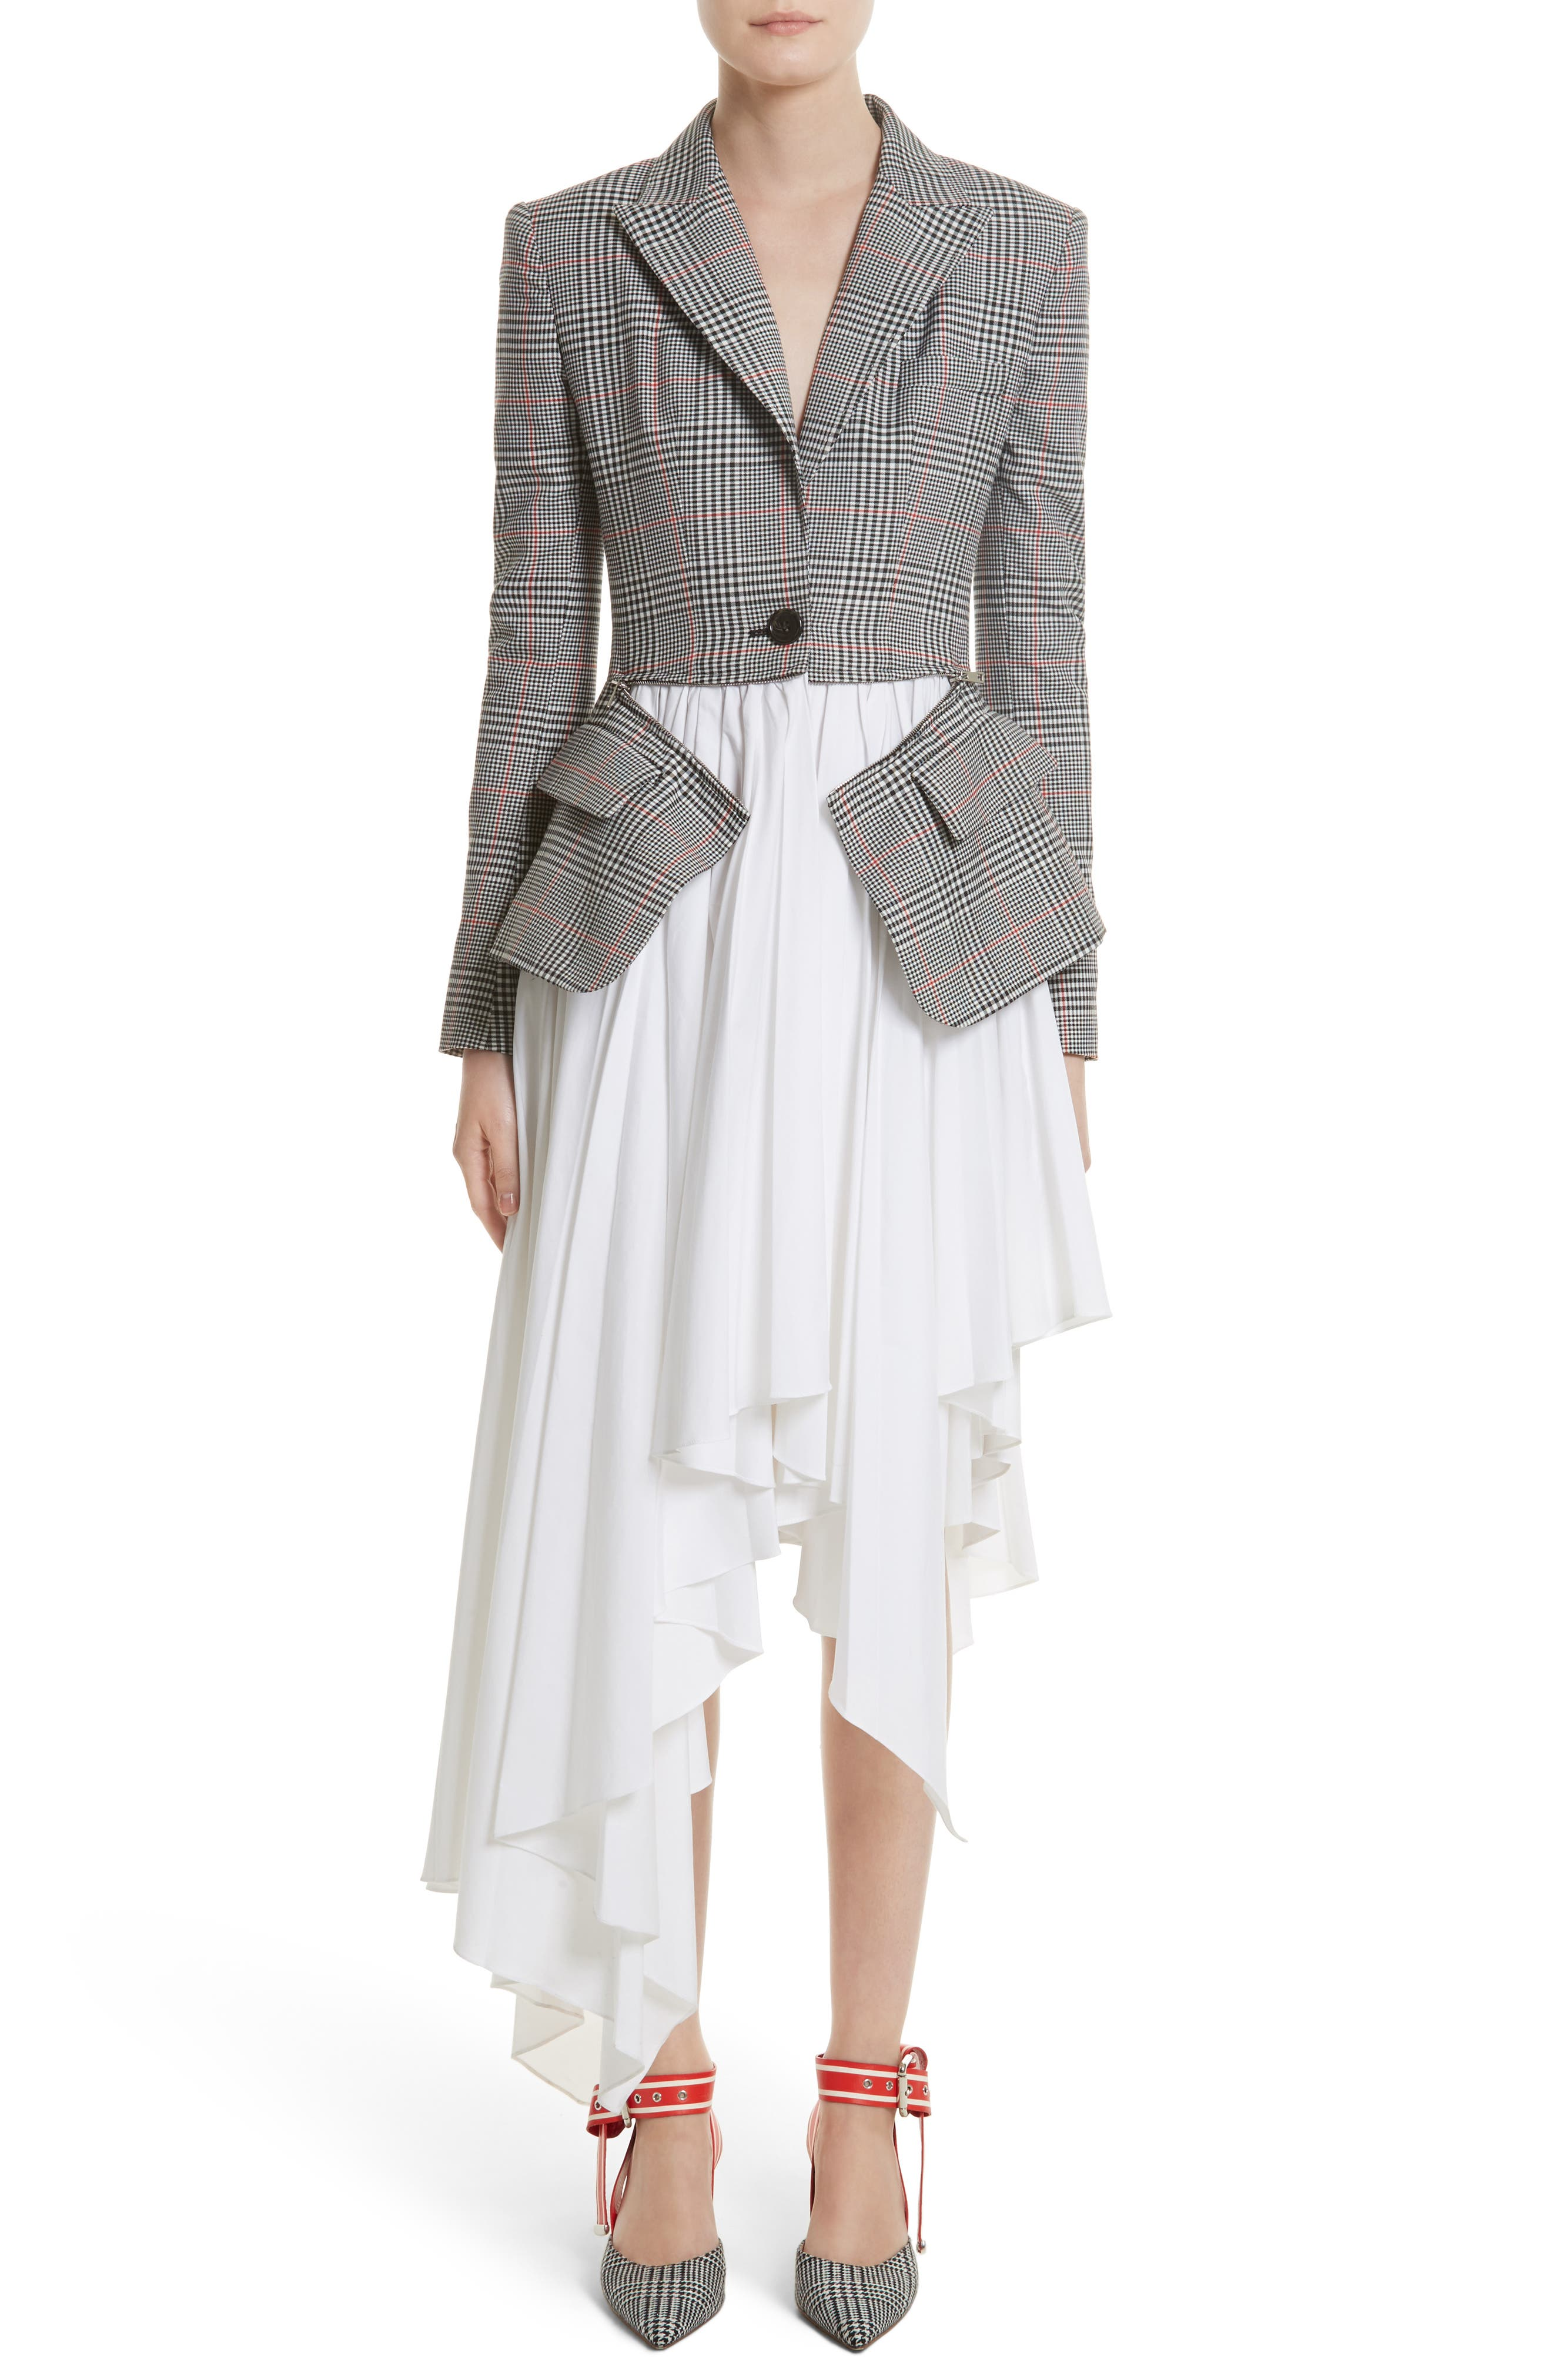 MONSE Glen Plaid Jacket Dress